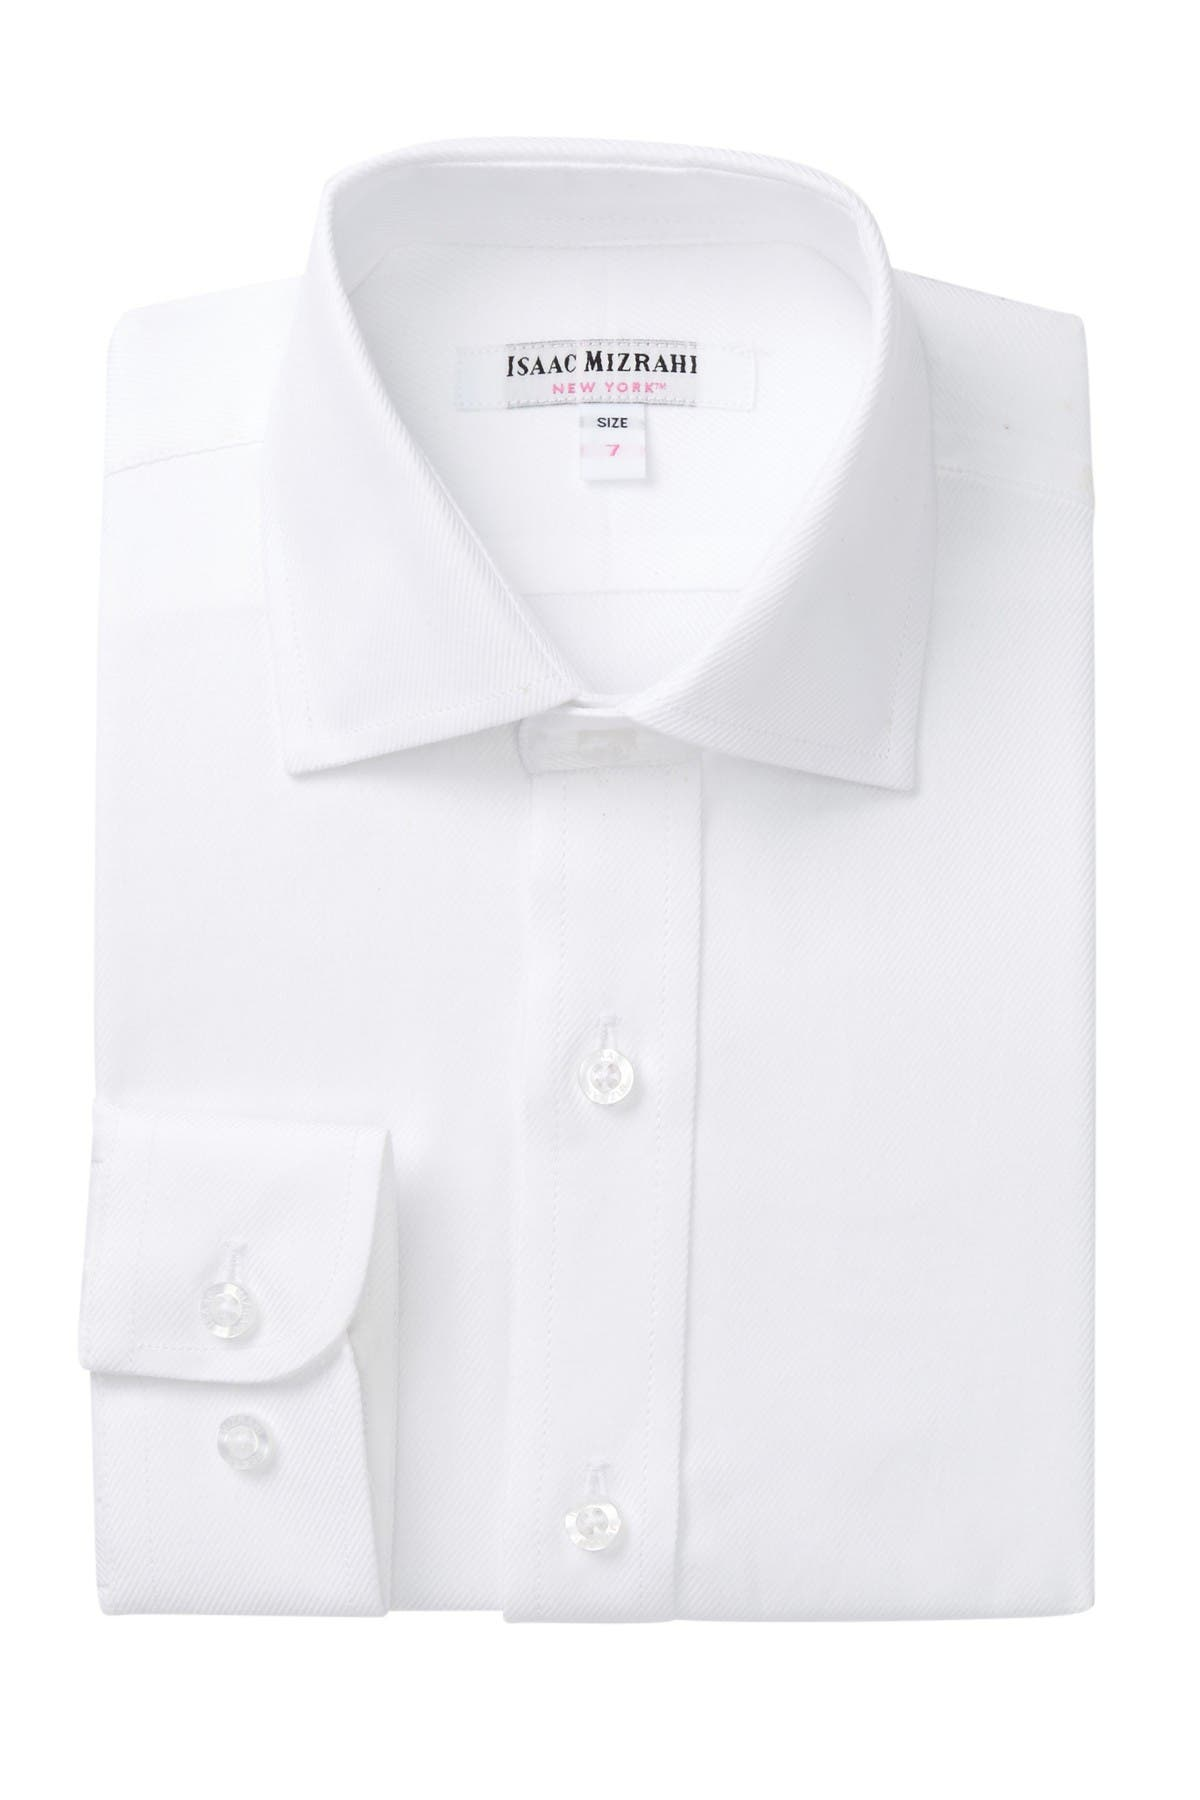 Image of Isaac Mizrahi Fashion Dress Shirt